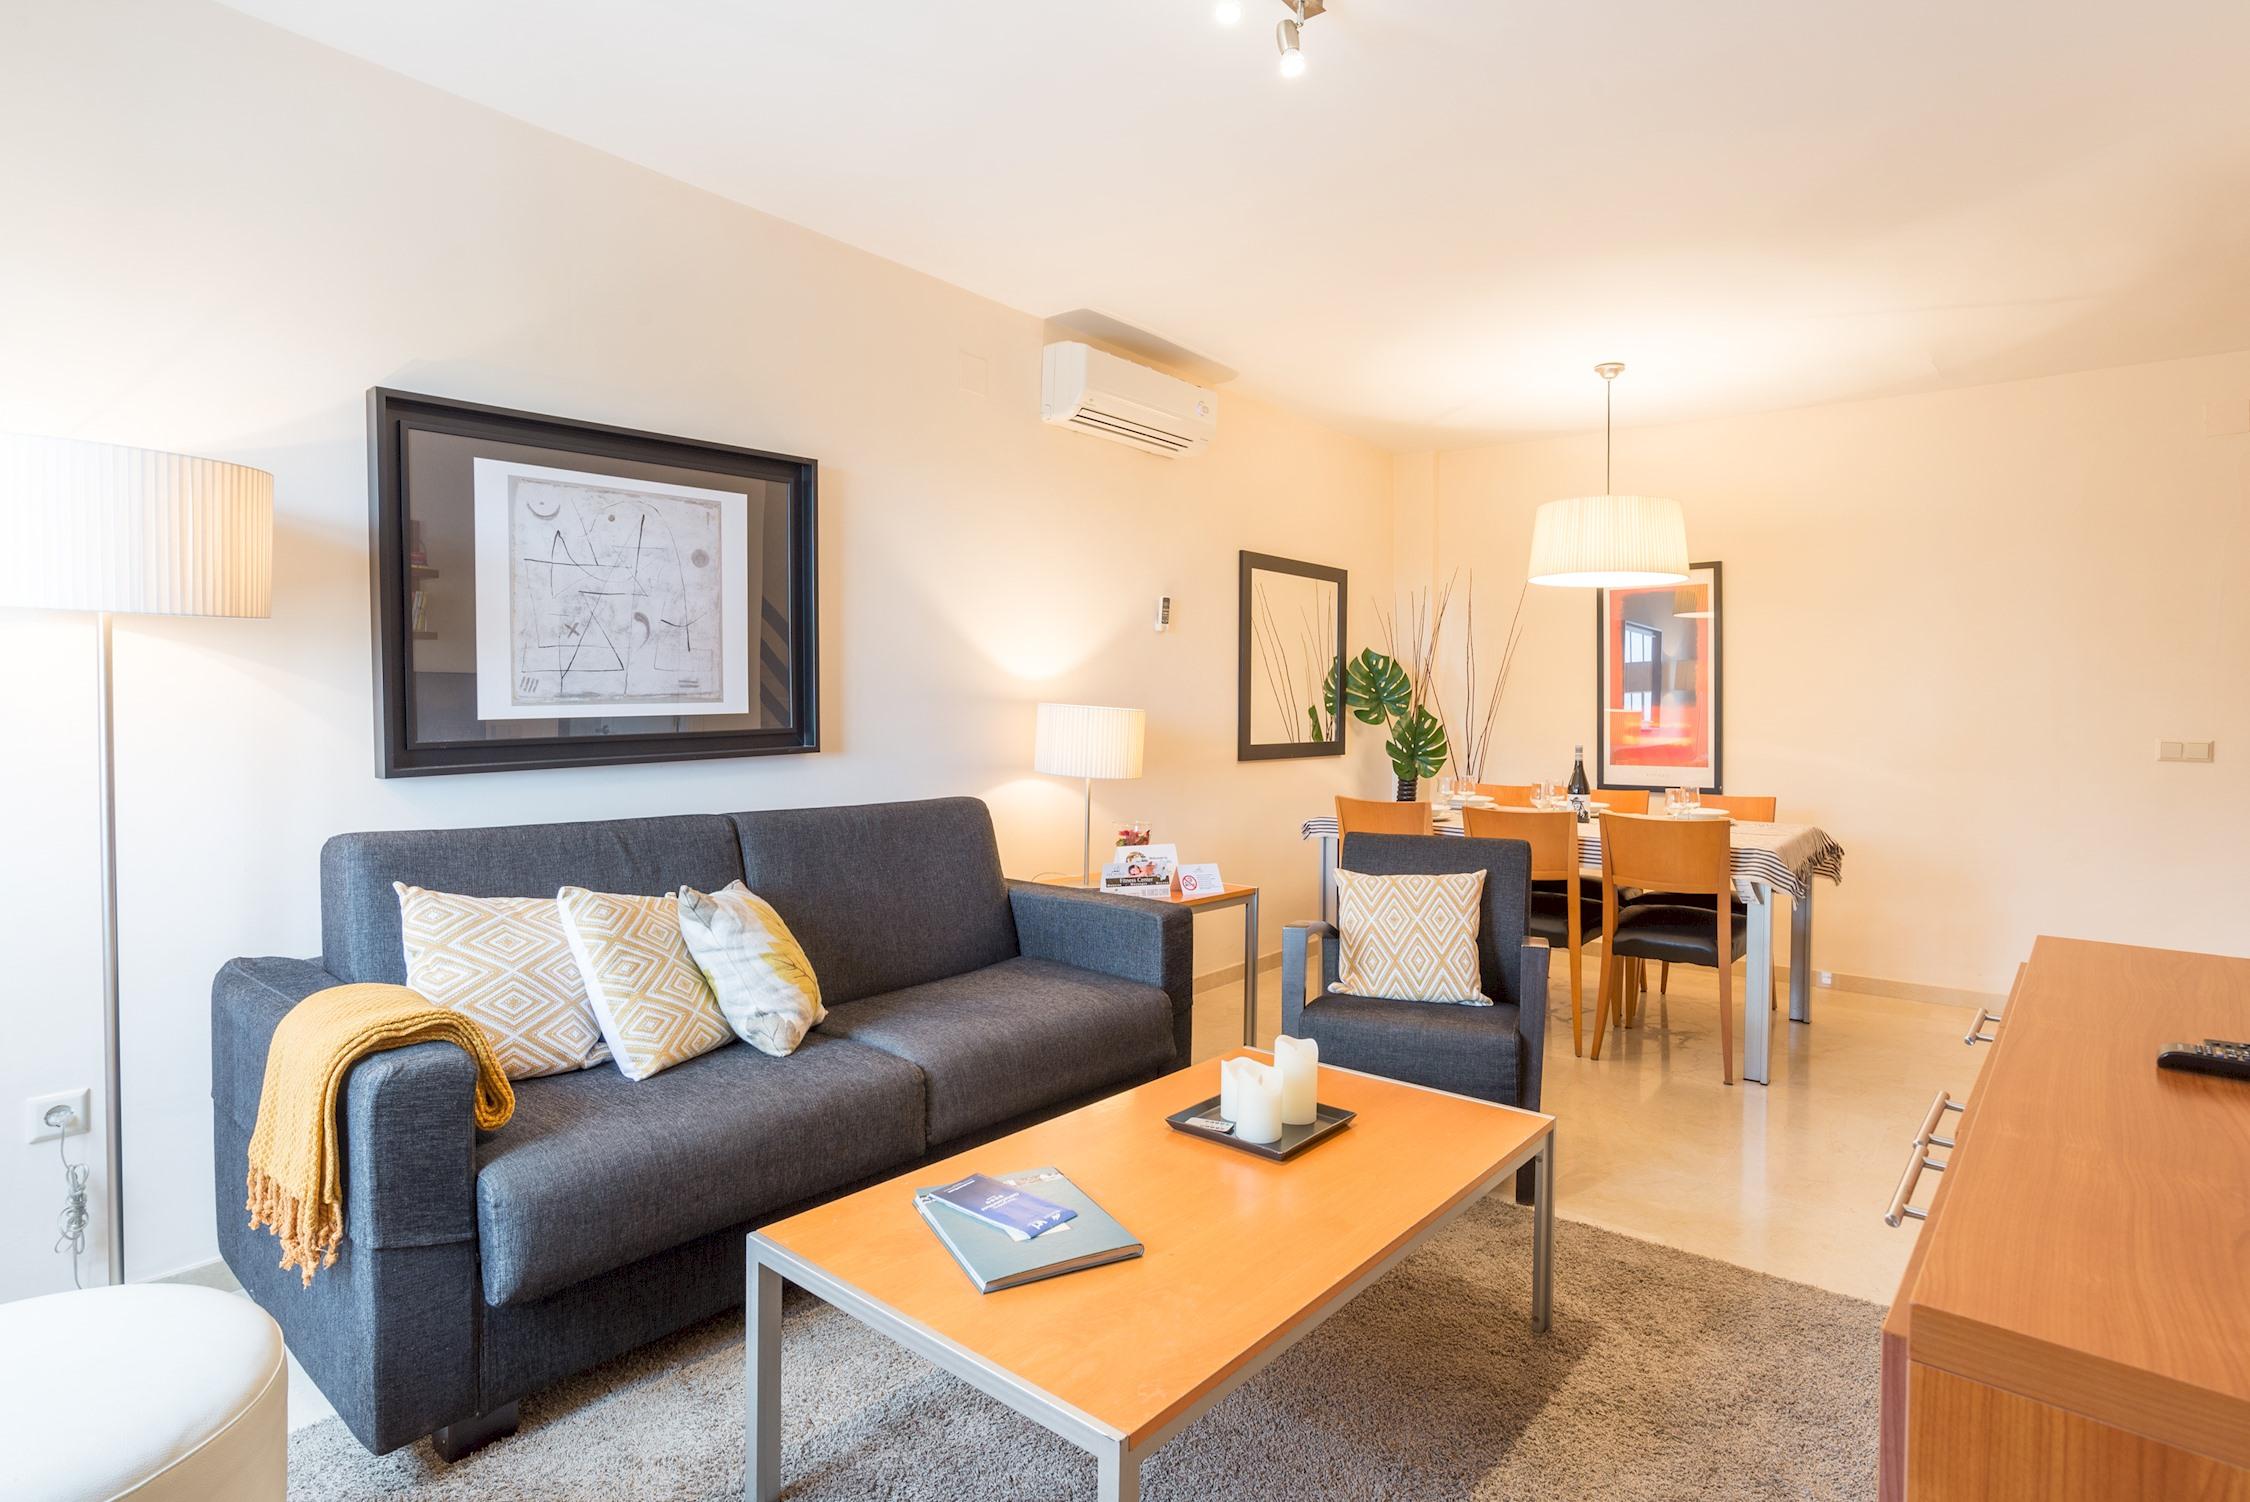 Apartment MalagaSuite Luxury   Relax photo 20237602